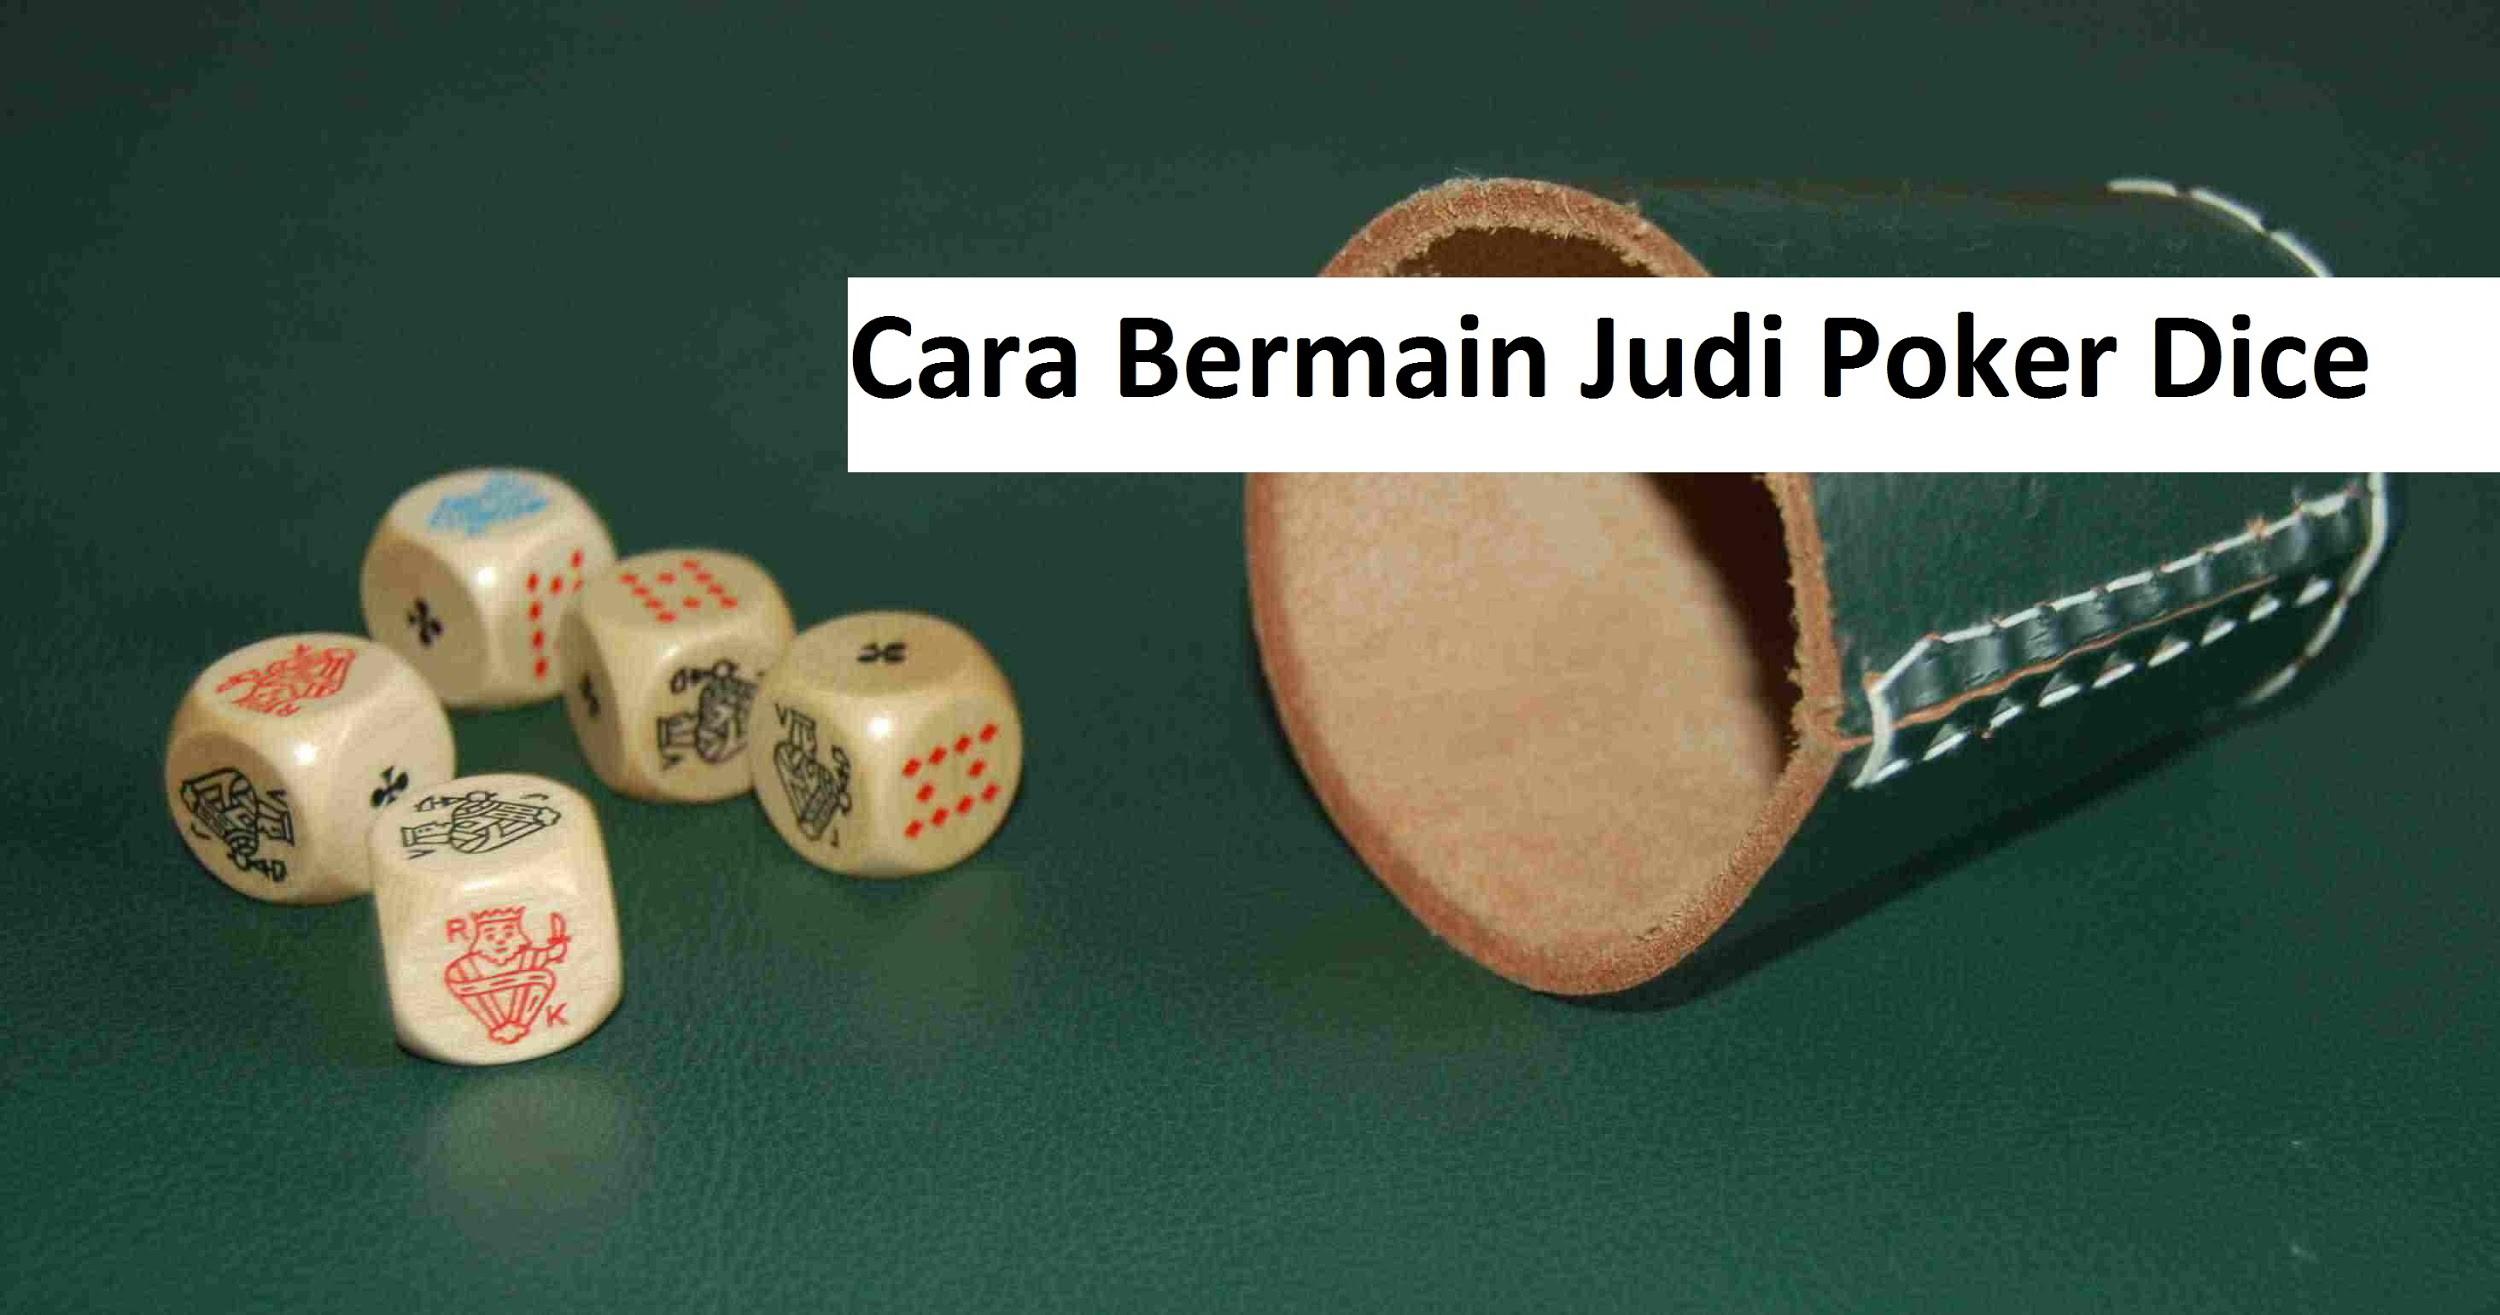 Cara Bermain Judi Poker Dice